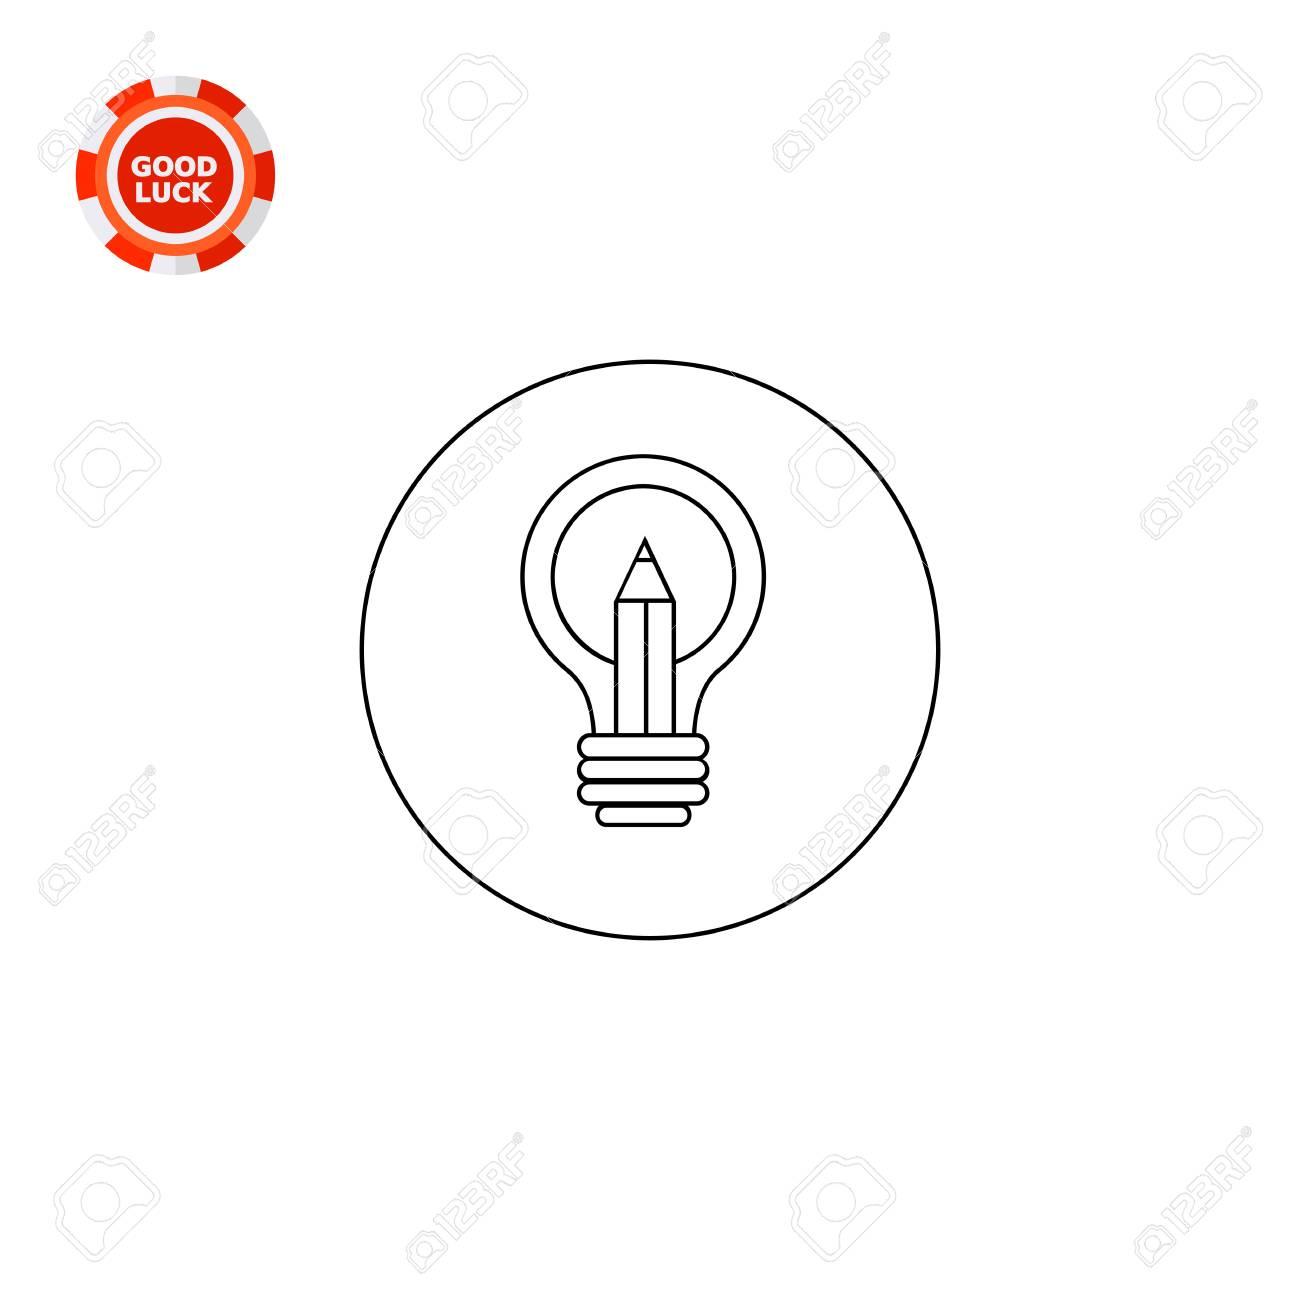 Pencil In Light Bulb As Symbol Of Creativity Metaphor Solution